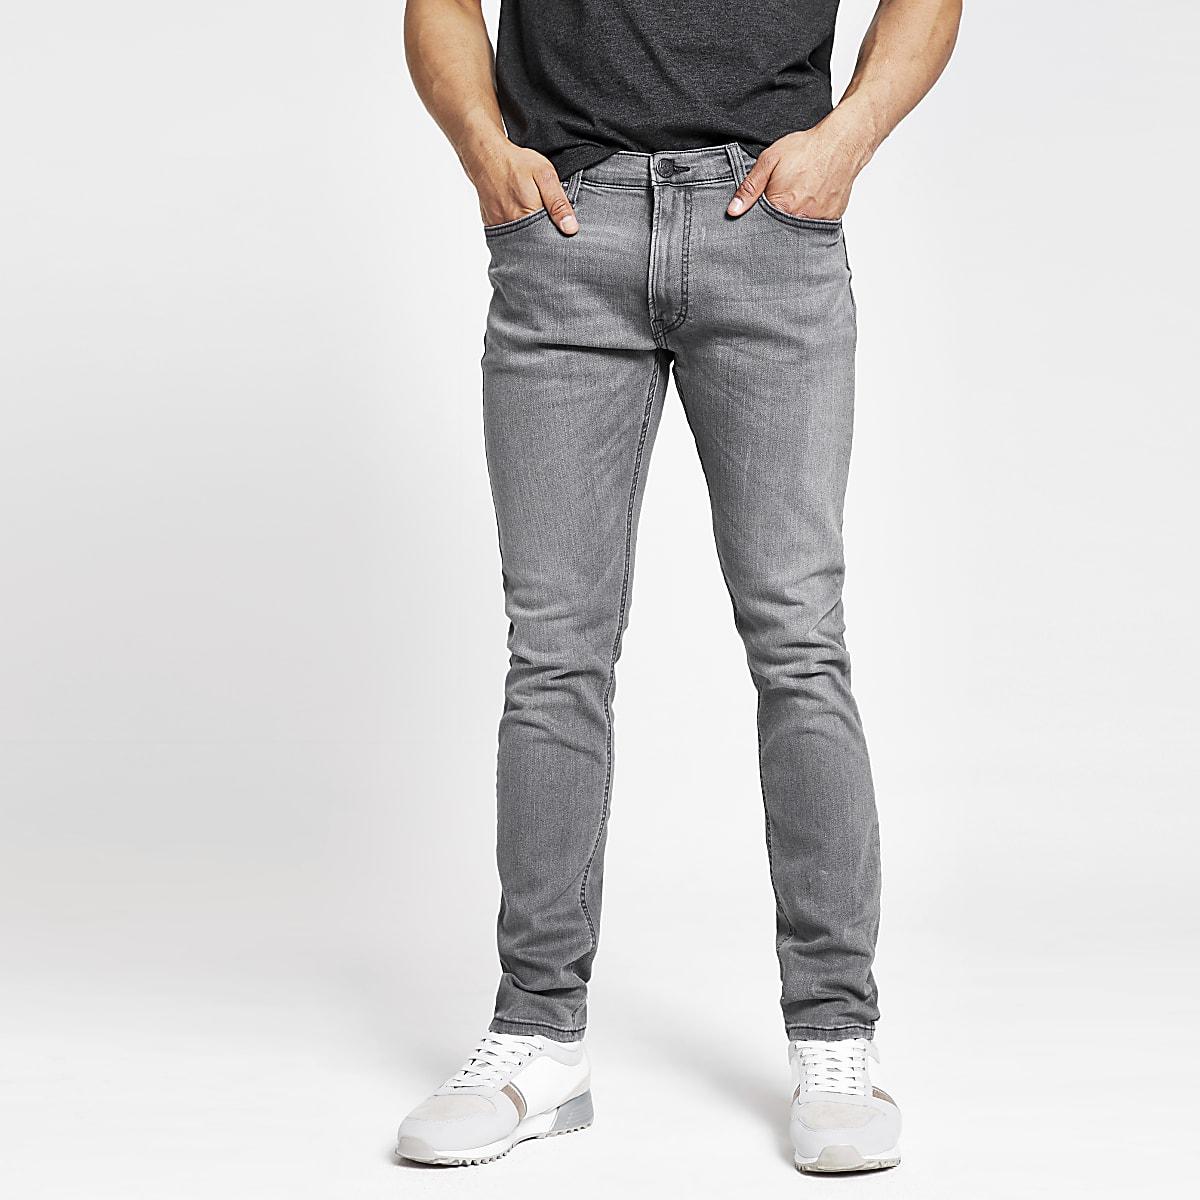 Lee grey tapered slim fit jeans